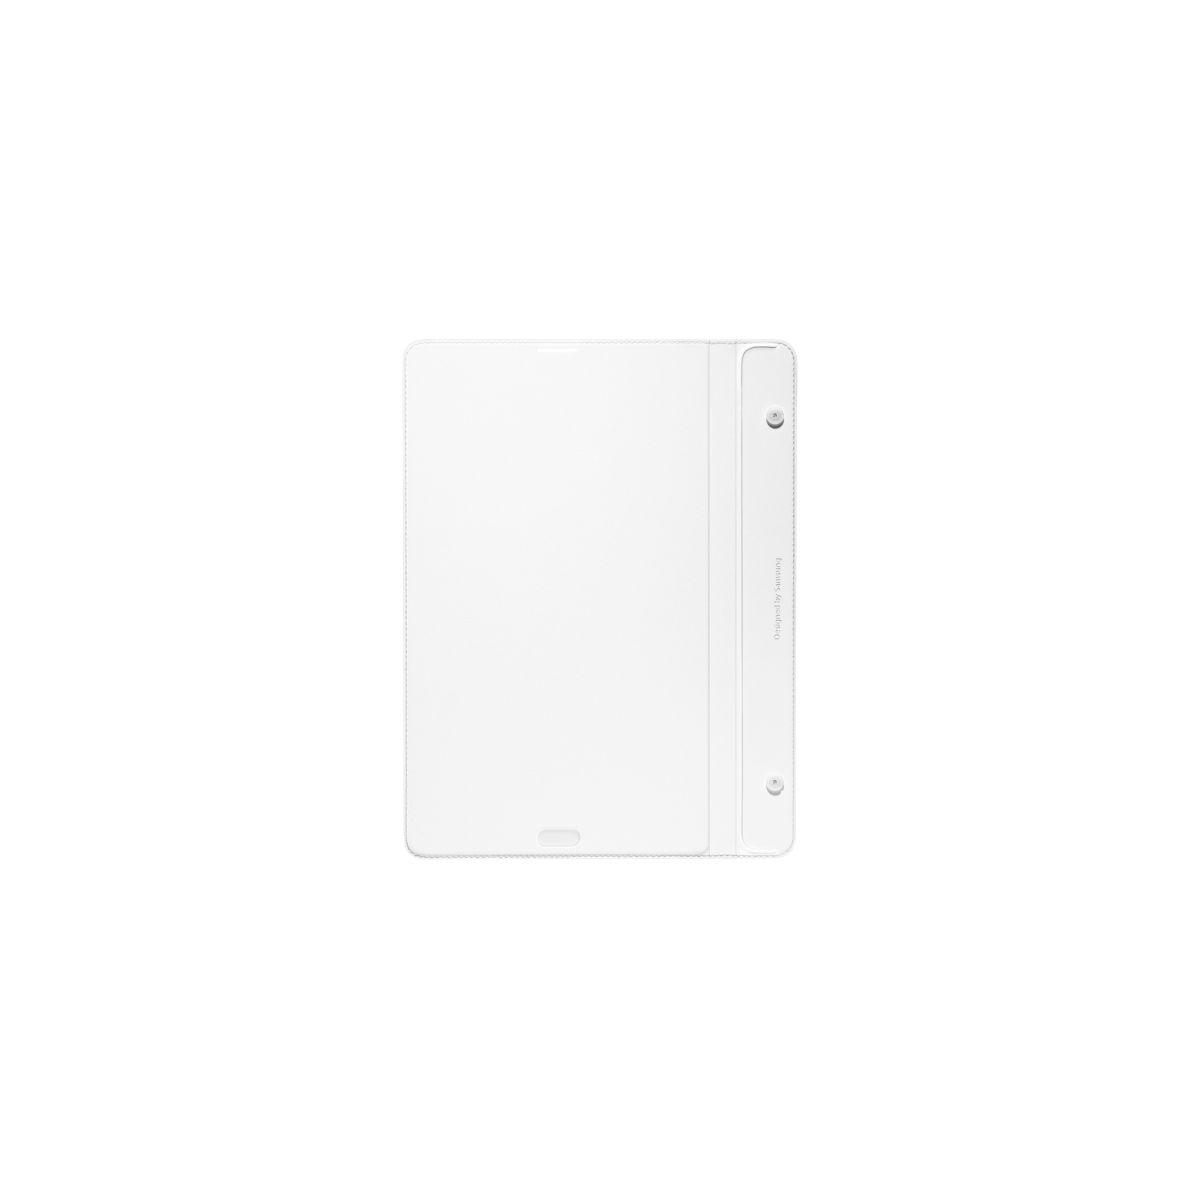 Cover samsung simple cover monaco tab s 8'' blanc - livraison offerte : code chronoff (photo)